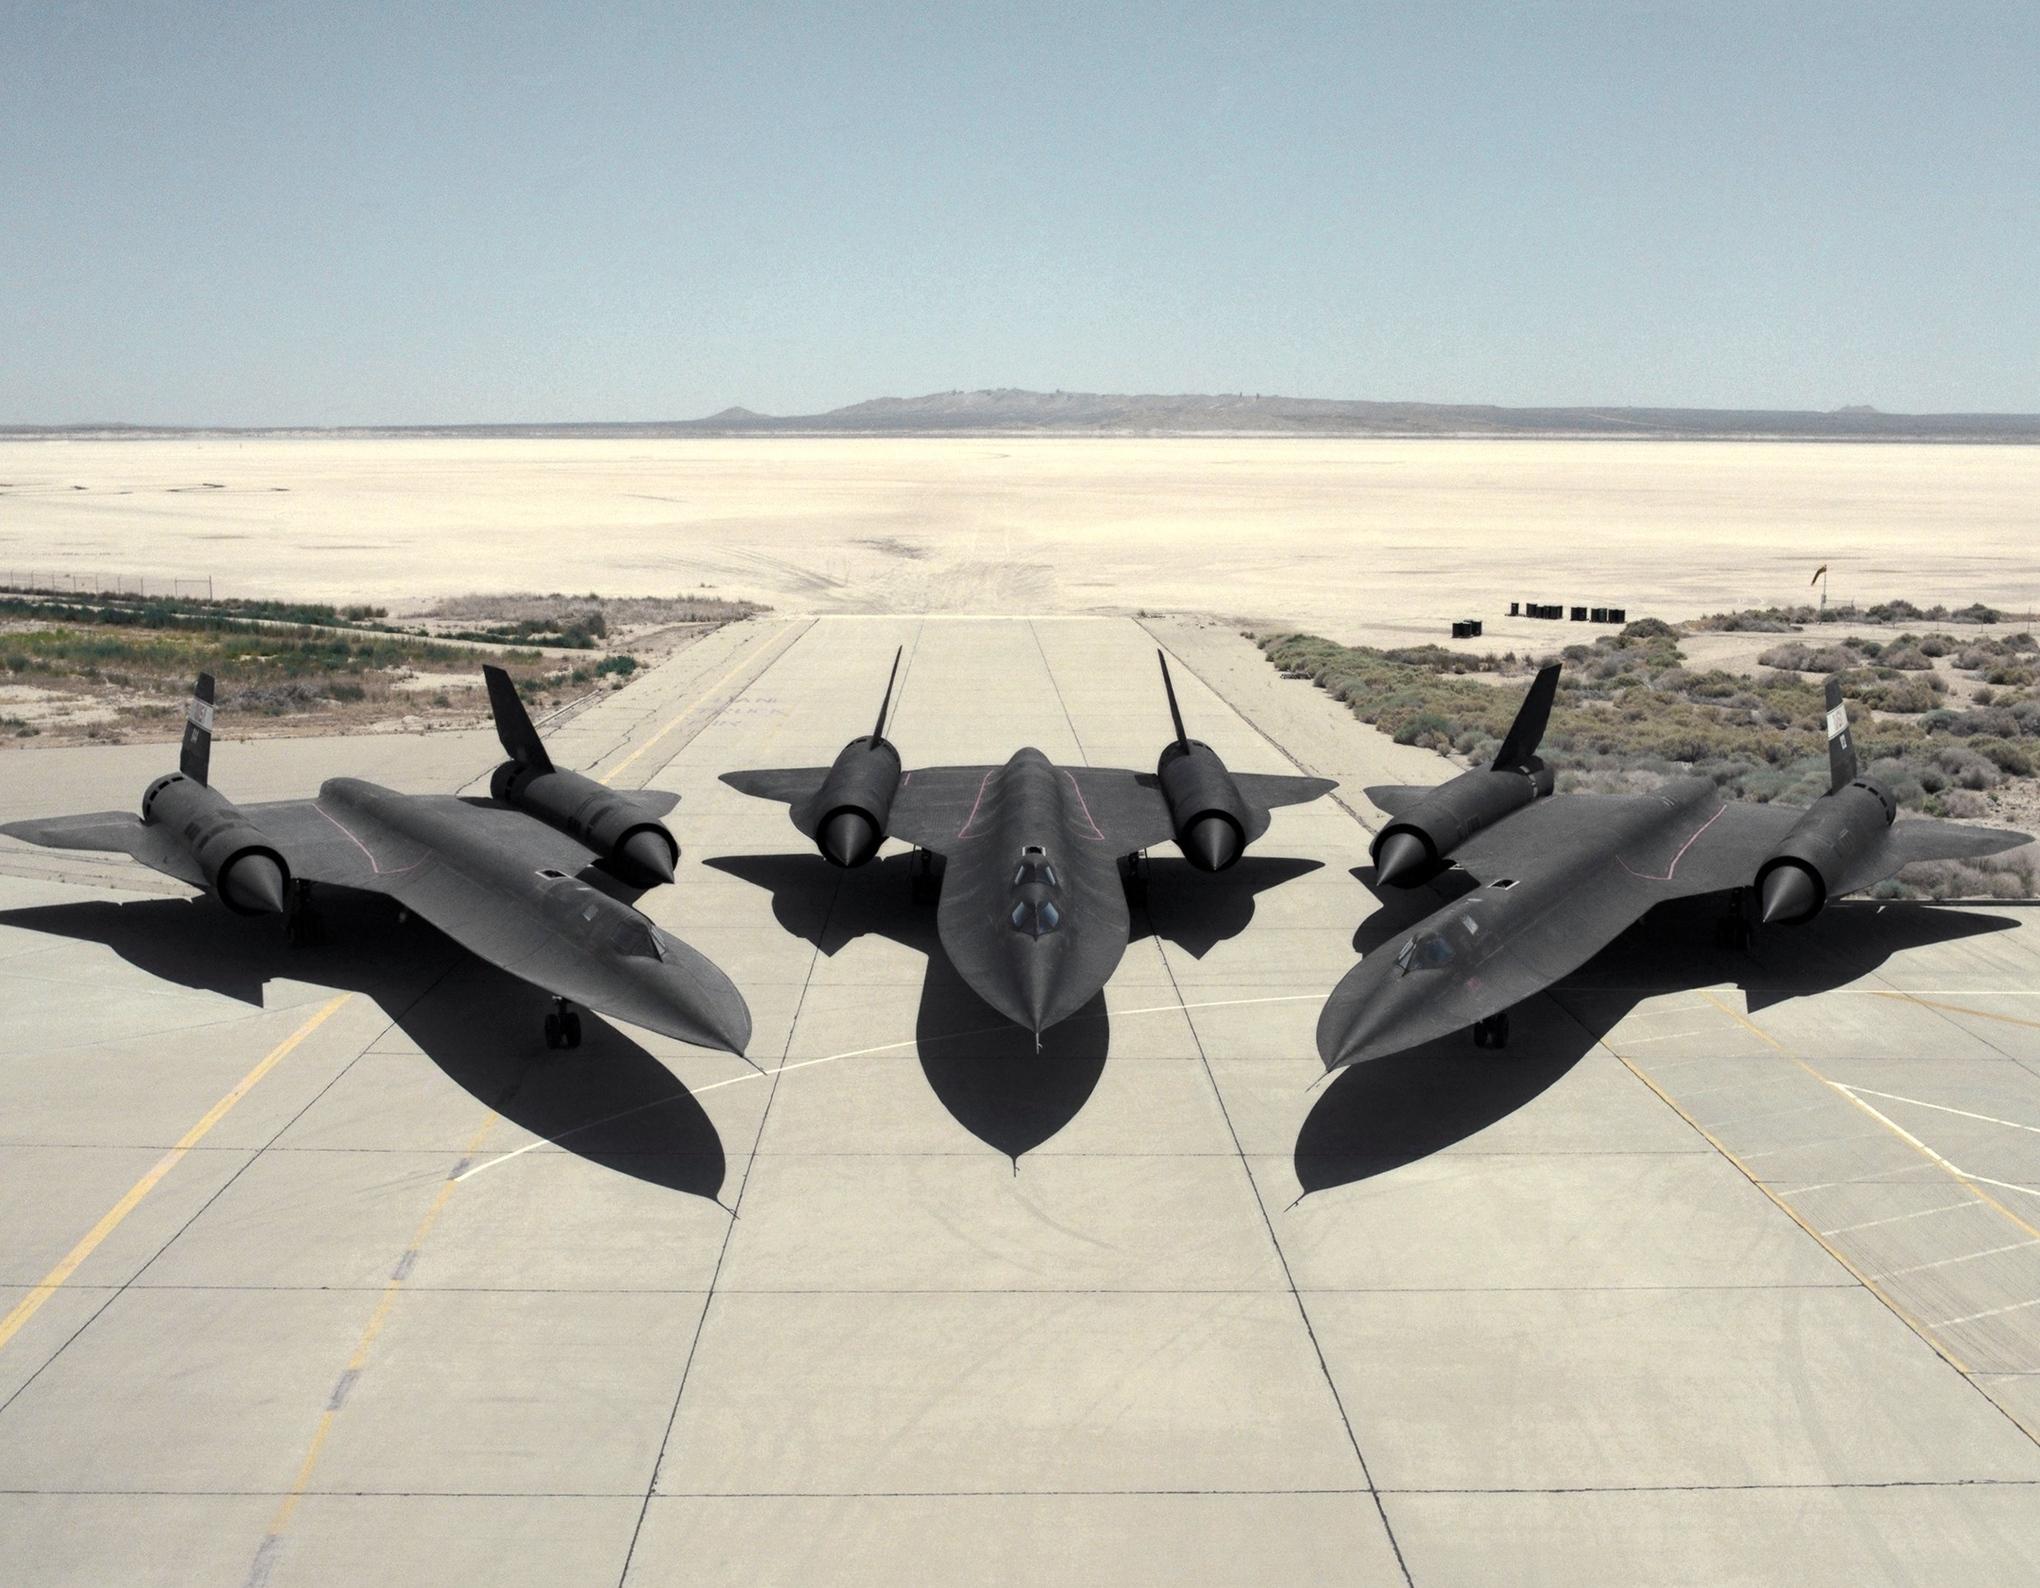 Lockheed_SR-71s.jpg